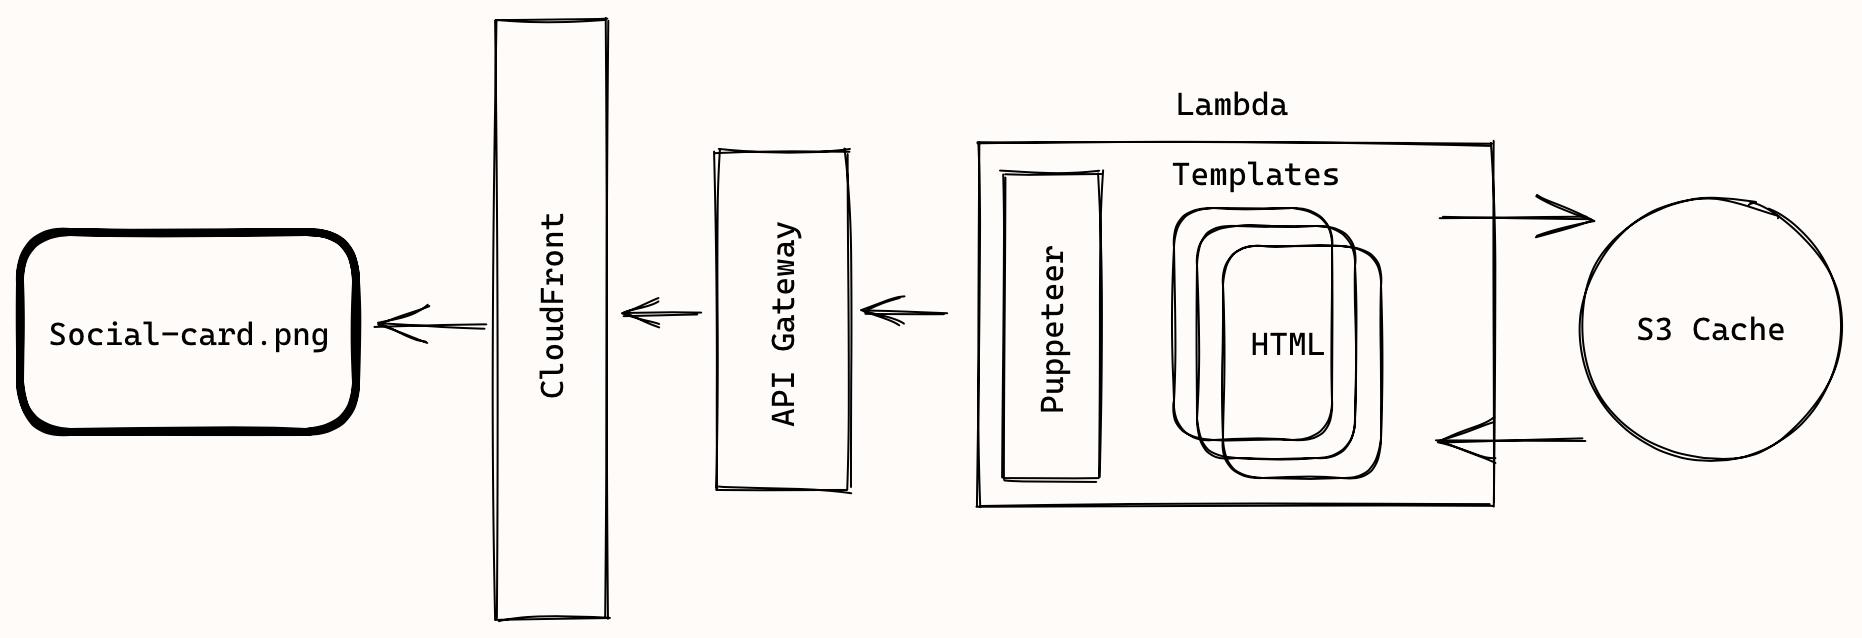 Social card service architecture diagram